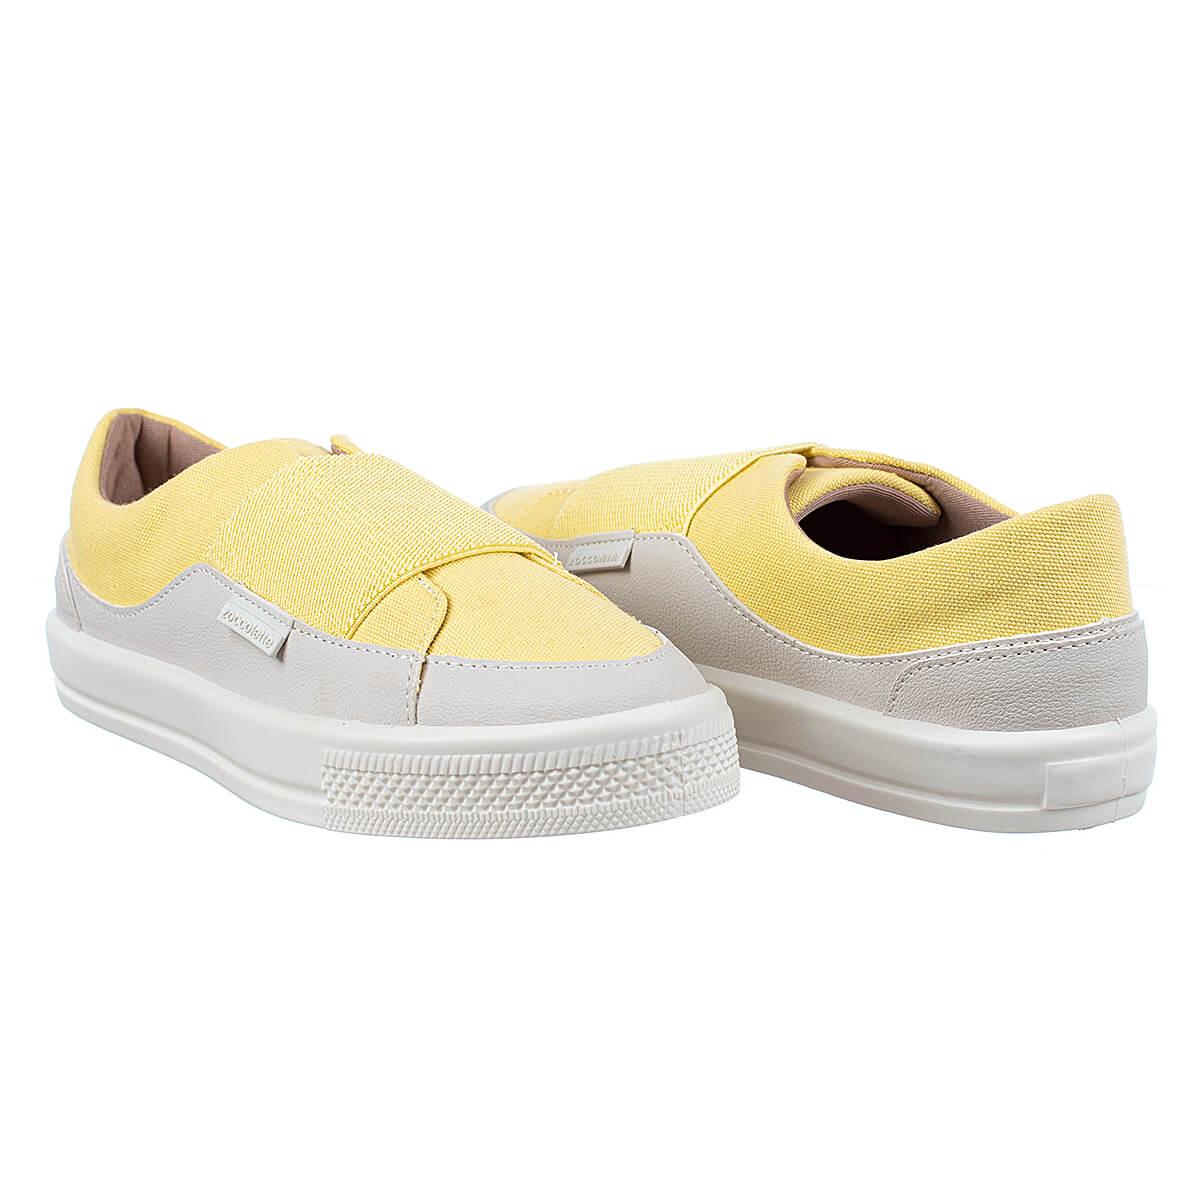 Tênis Casual Feminino Elastico Amarelo